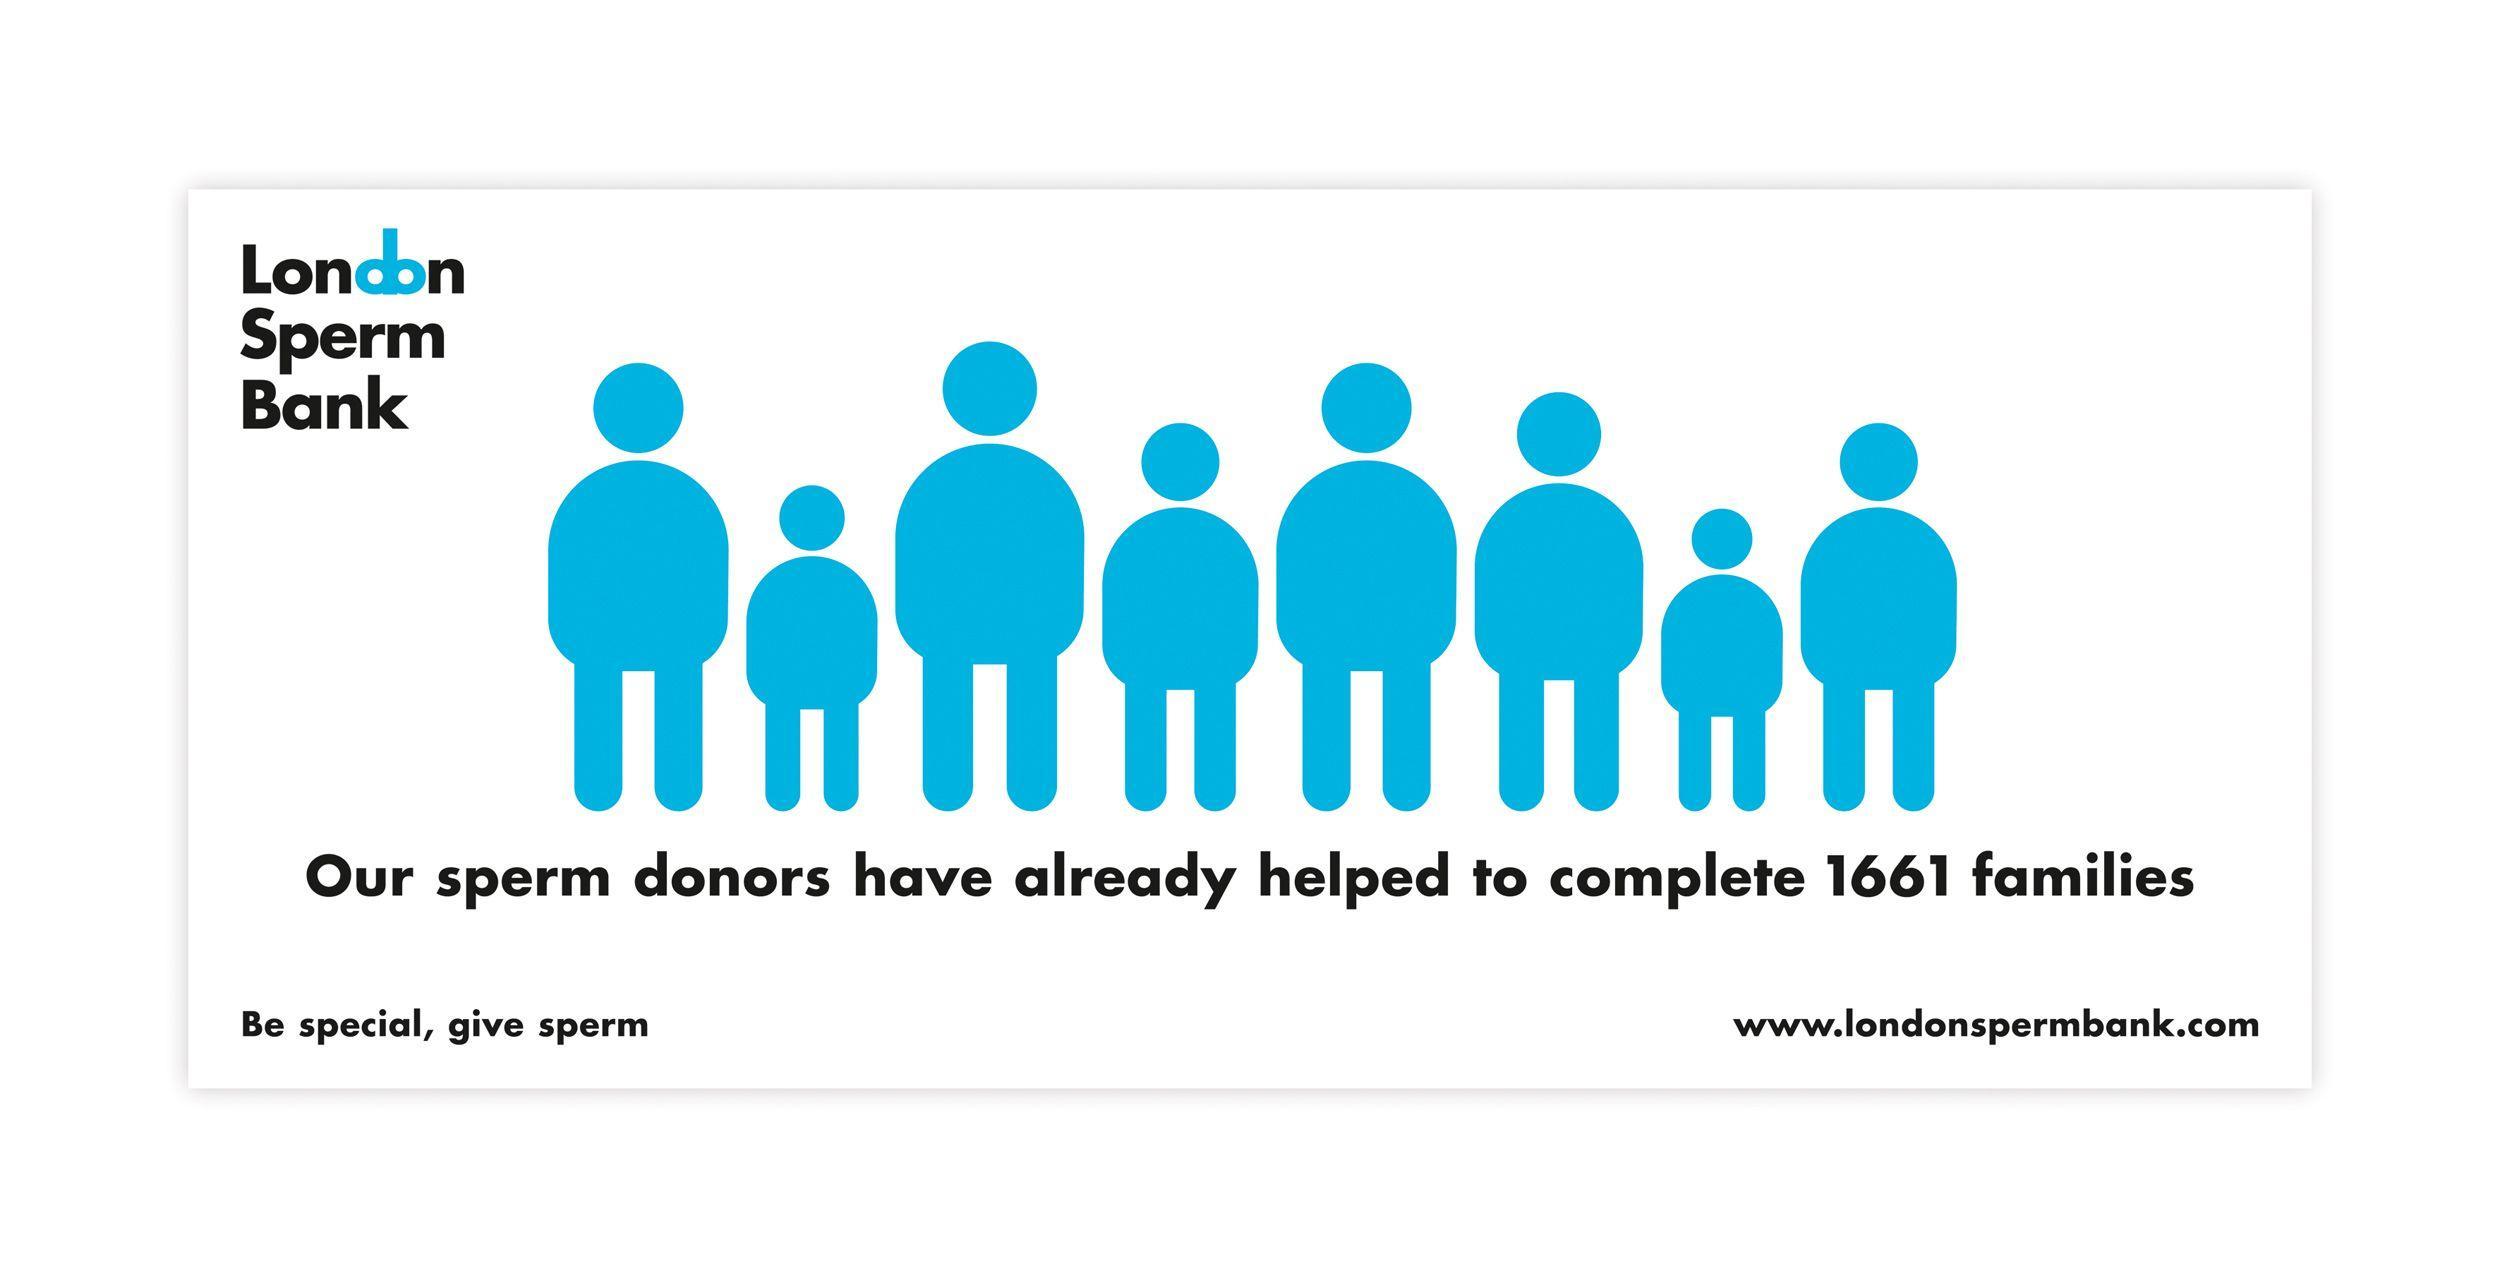 Sperm donation campaign